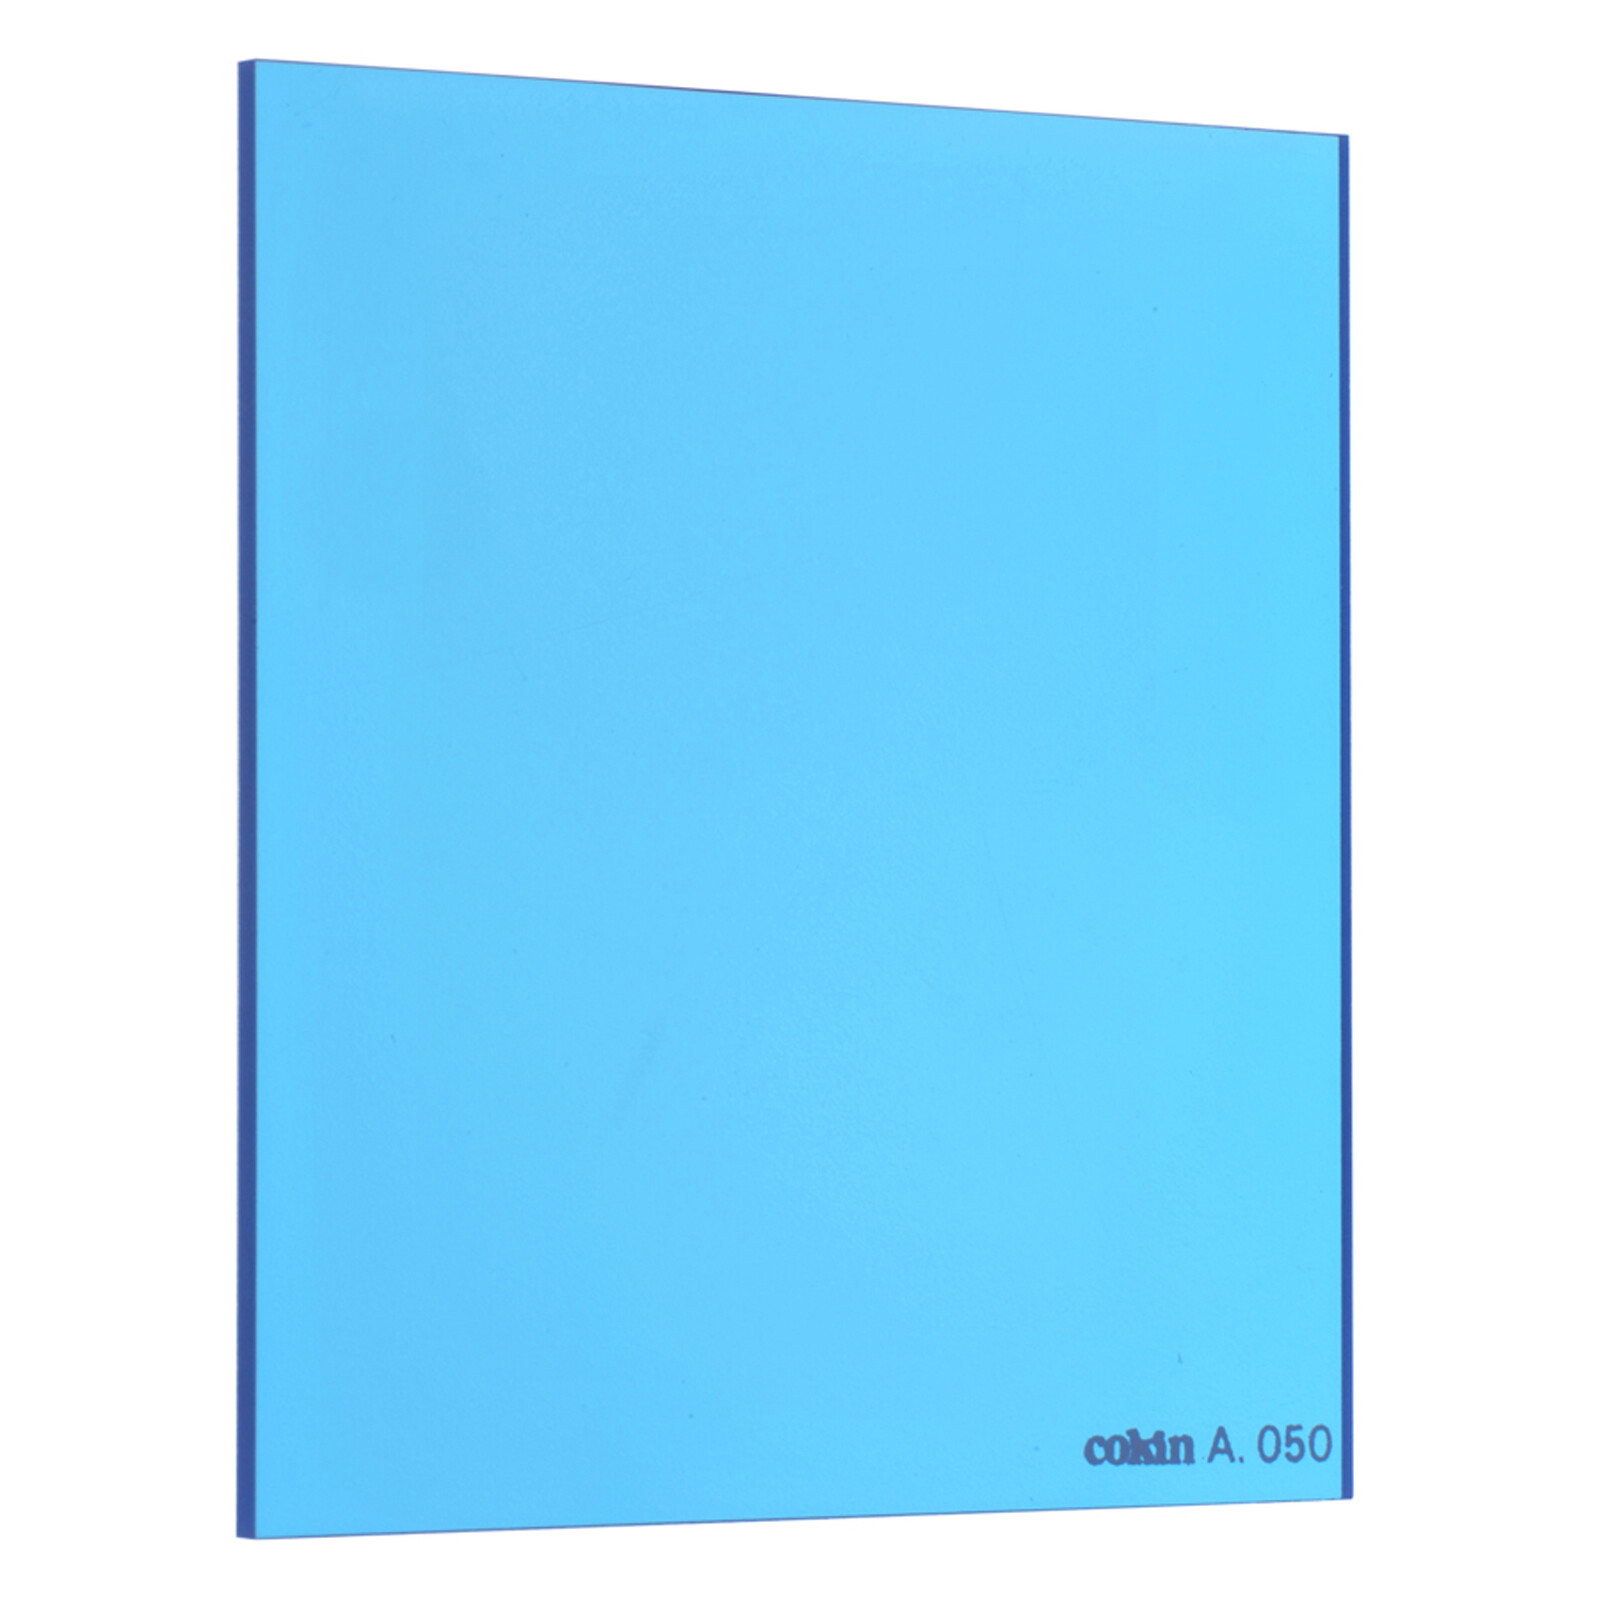 Cokin A050 Cyan